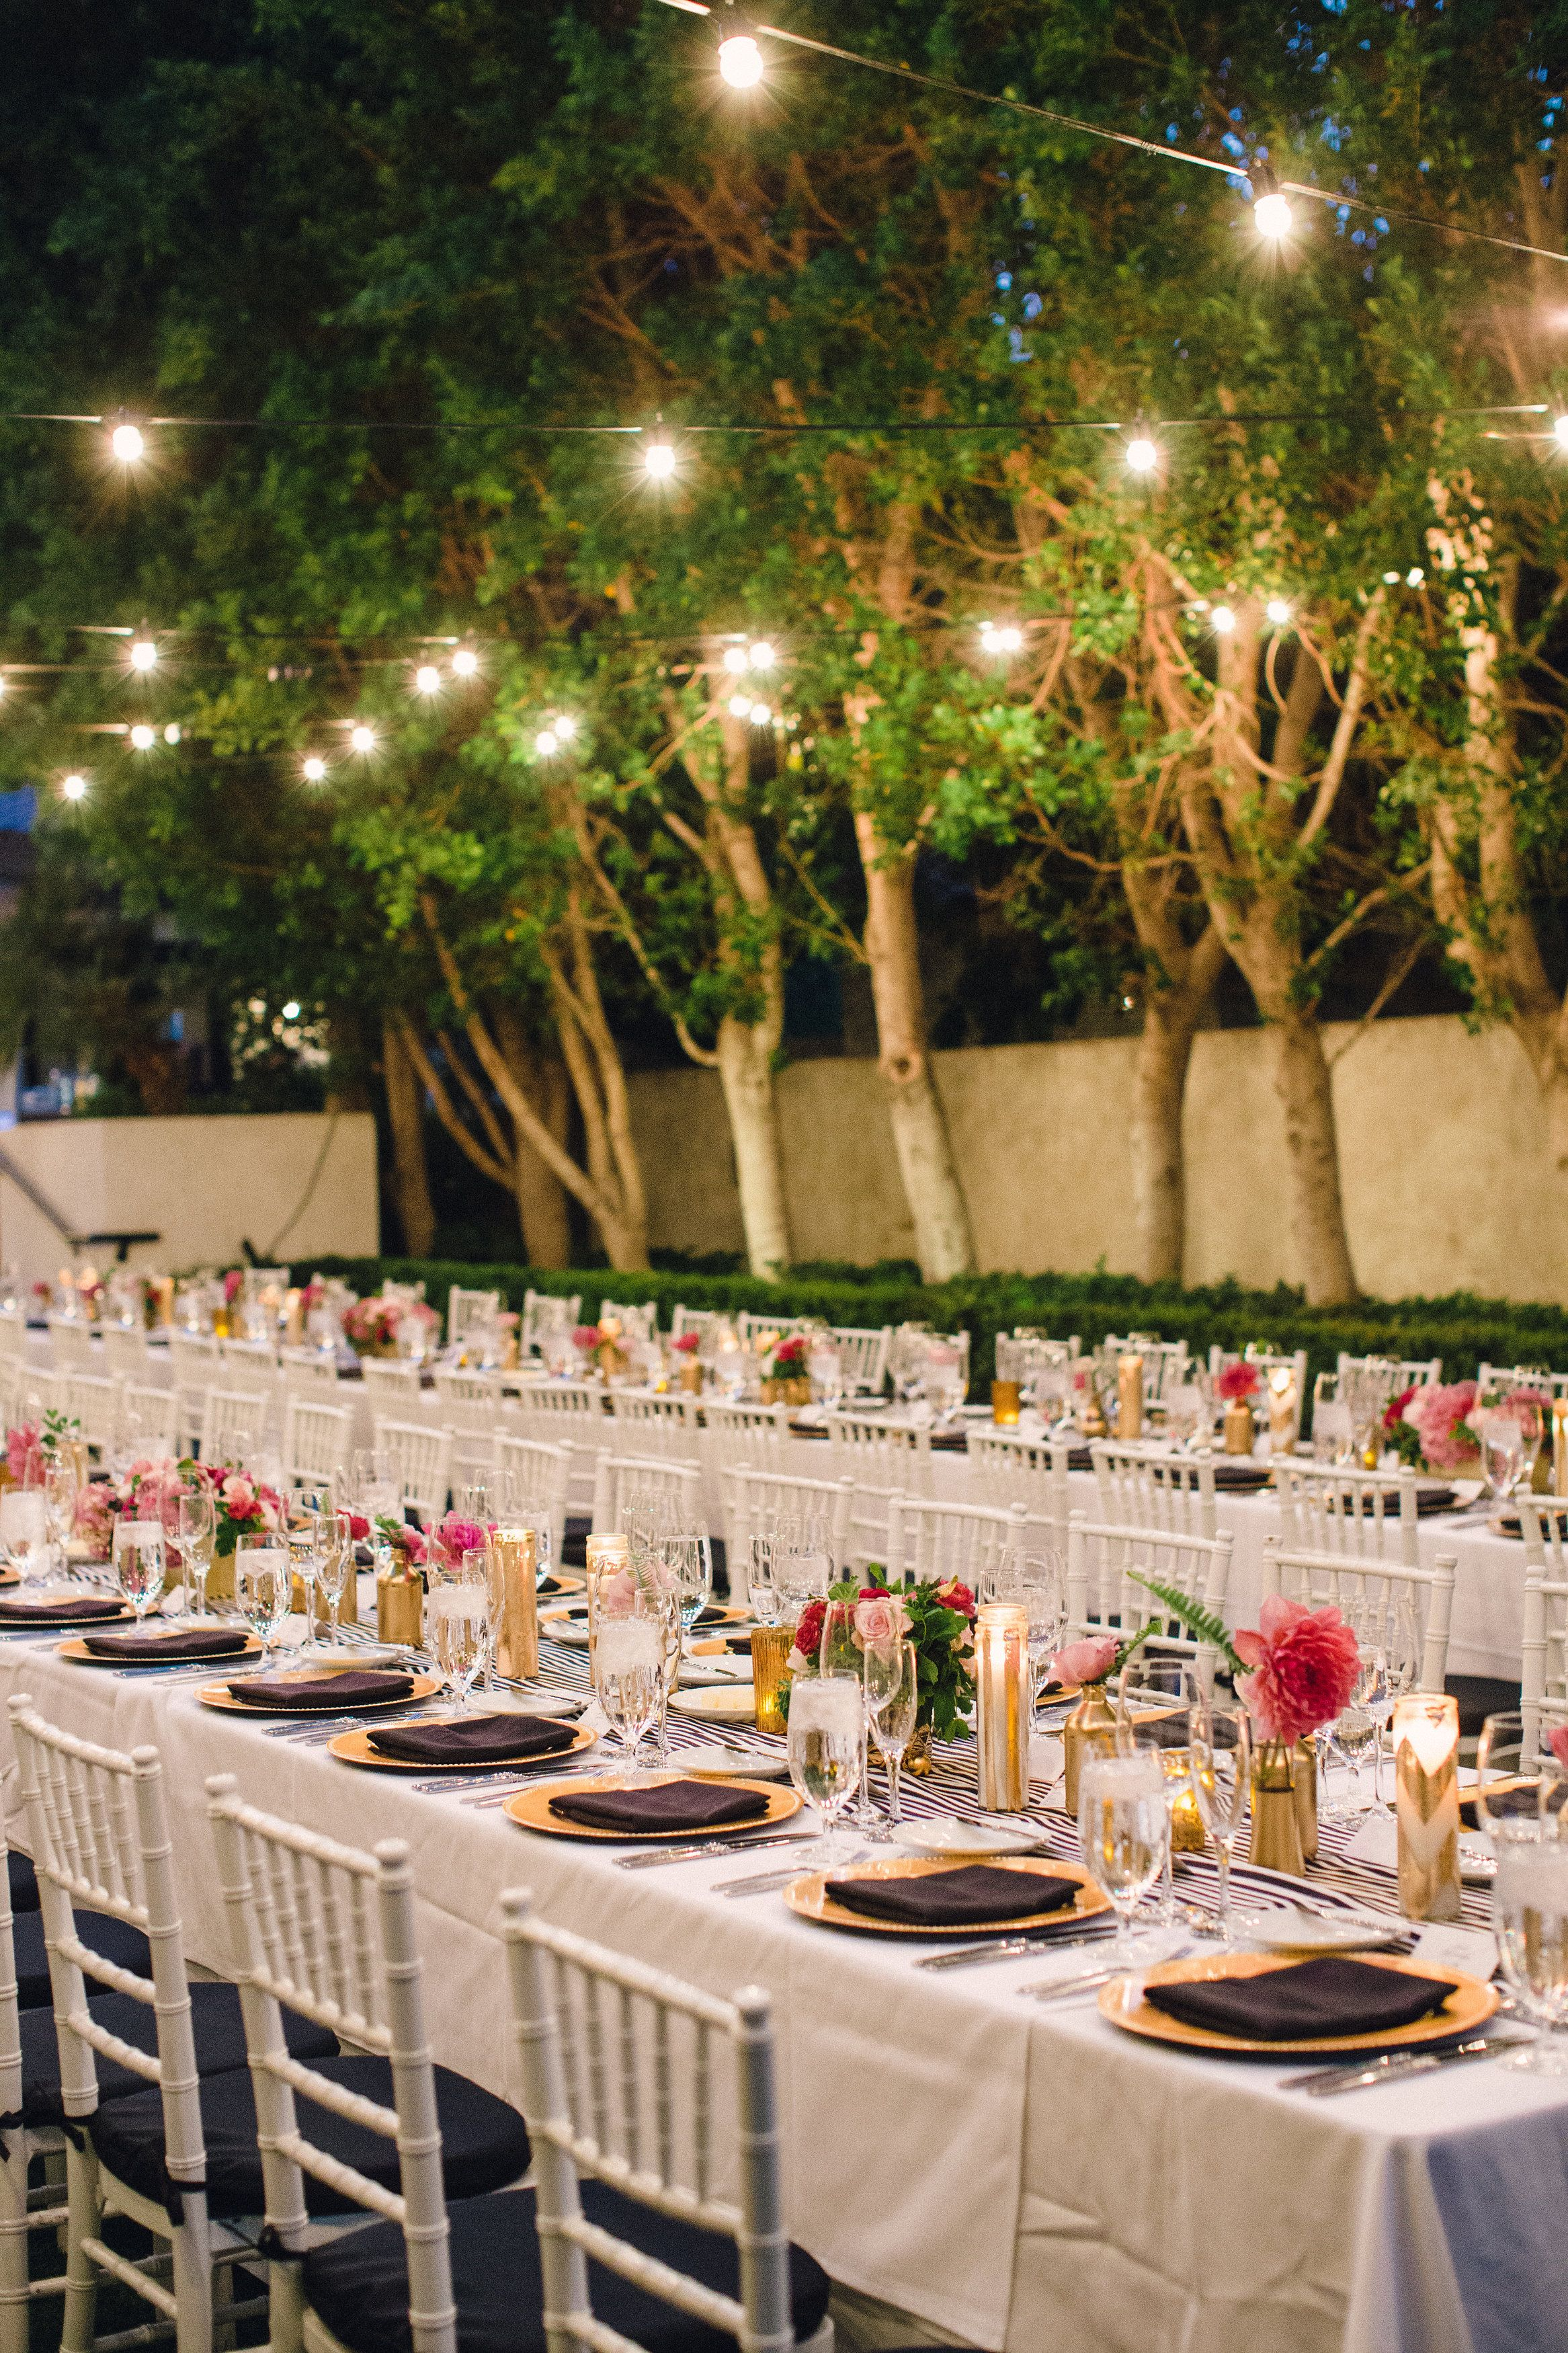 viceroy september wedding warm light gold u0026 black accents